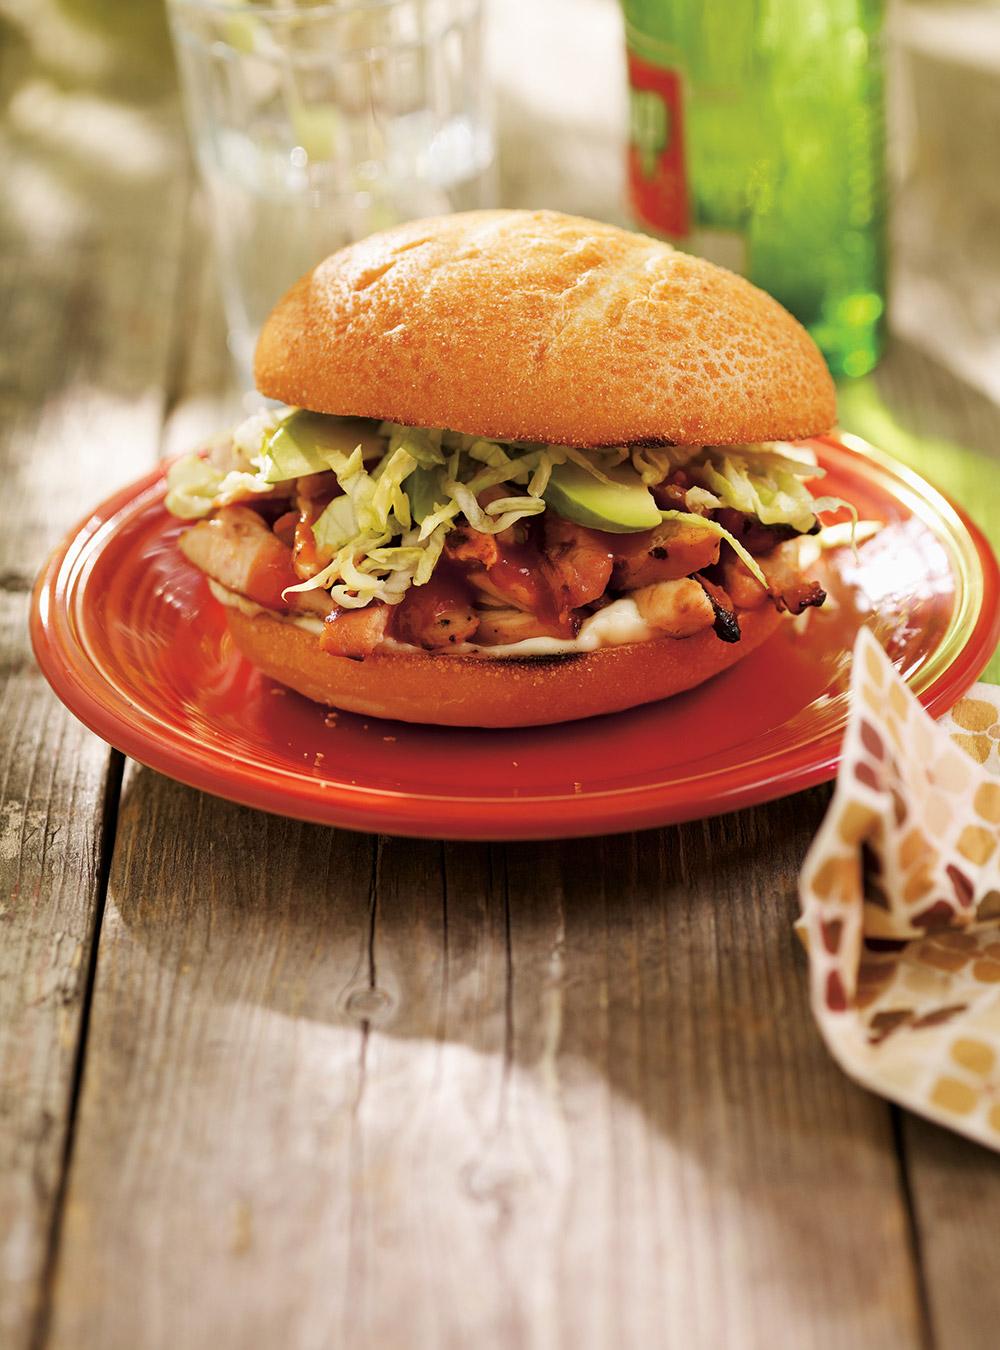 Burgers au poulet barbecue | ricardo